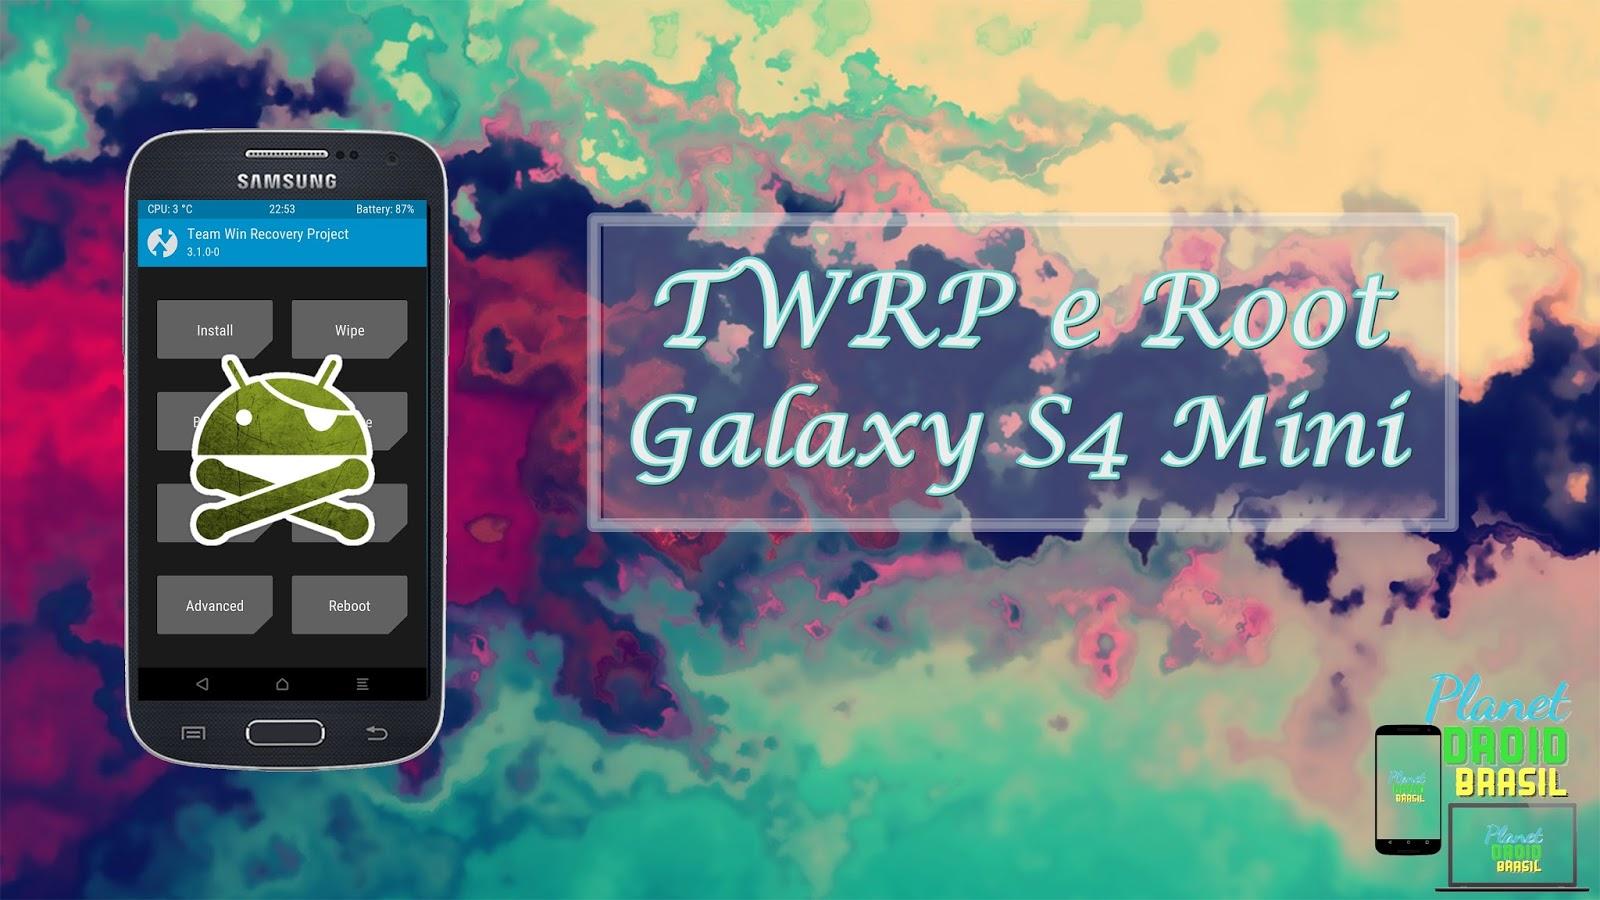 How to root samsung galaxy s4 mini gt i9192 - Saiba Agora Mesmo Como Fazer Root E Instalar O Twrp No Seu S4 Mini